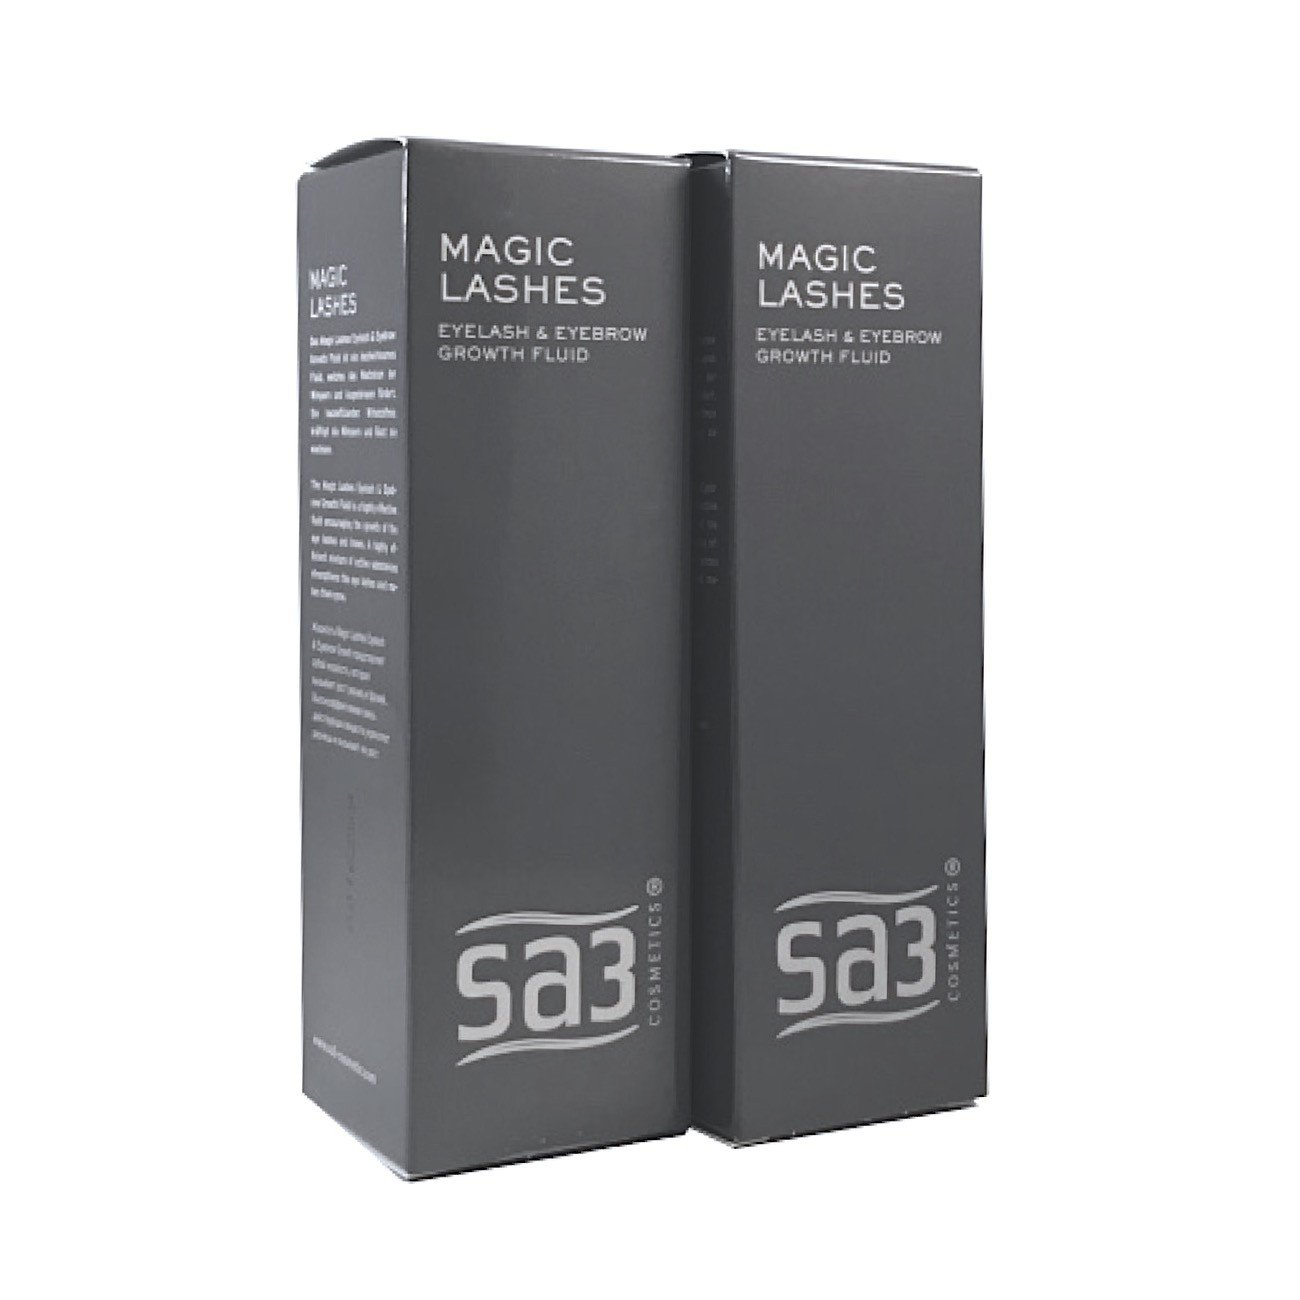 SA3 Magic Lashes Wimpernserum, 2er Pack (2x4ml) SA3 Cosmetics